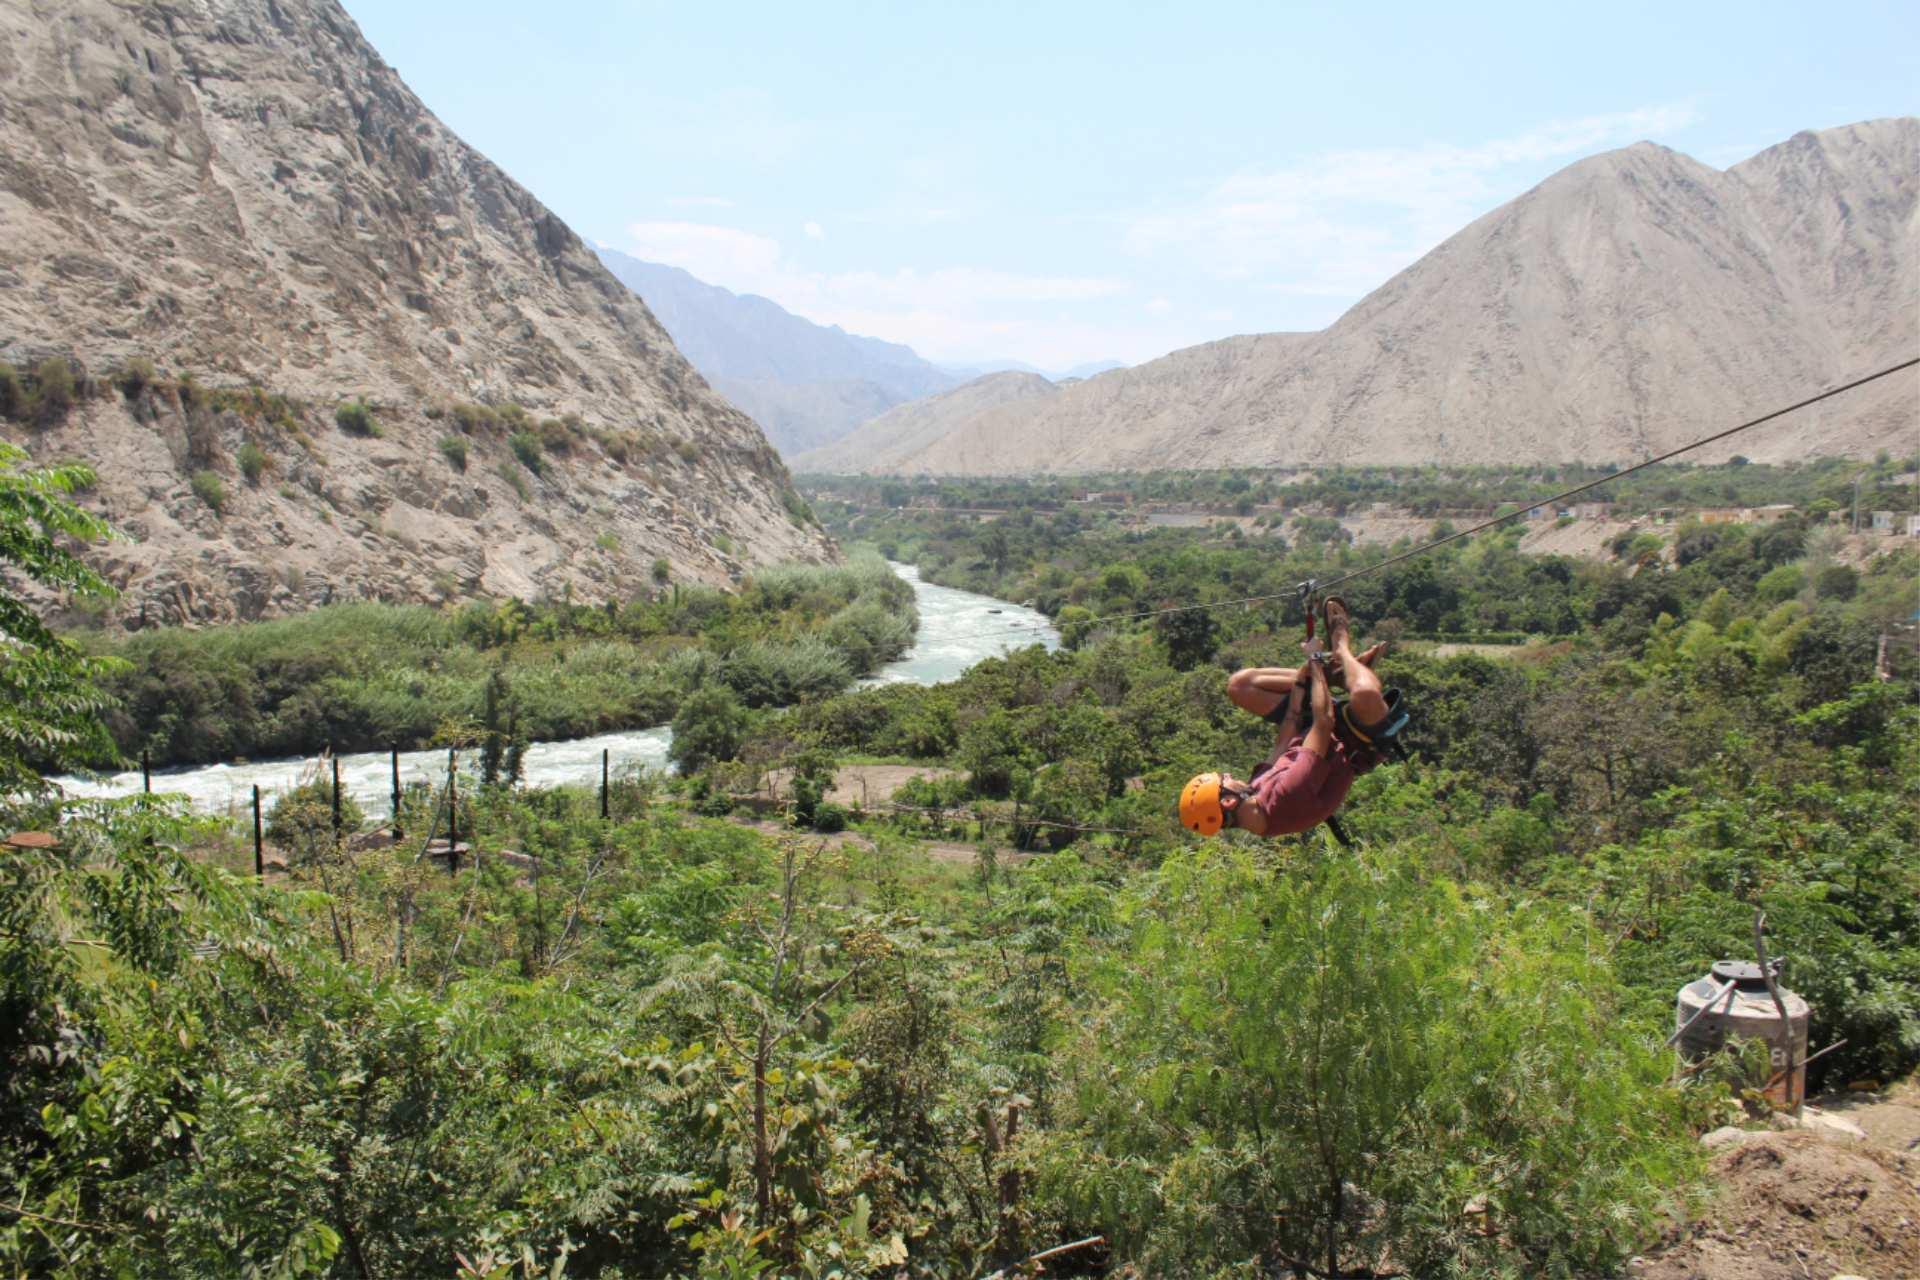 https://infromtheoutpost.com ziplining in Lunahuaná, Peruttp://infromtheoutpost.com